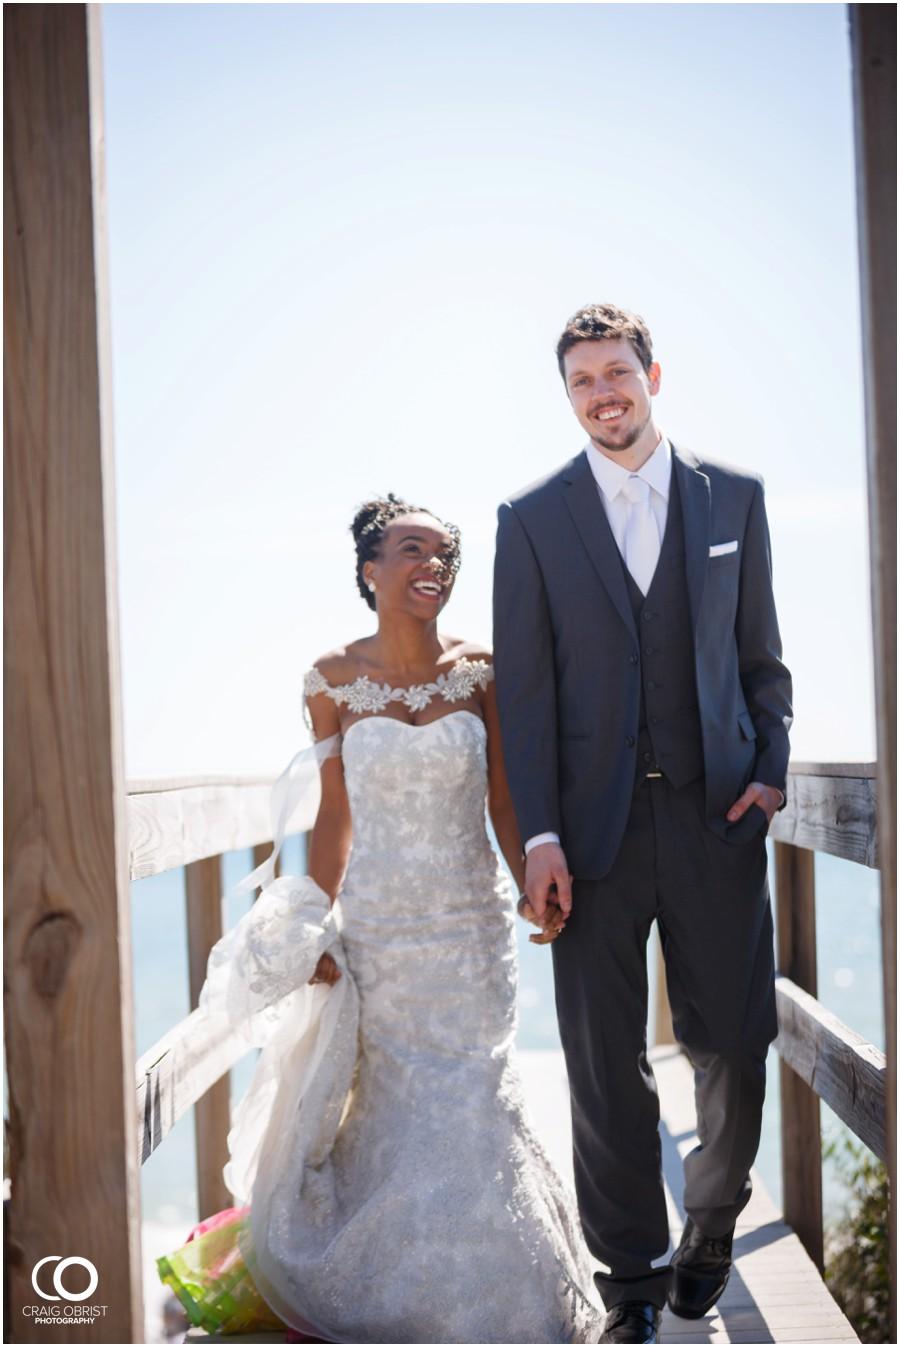 Seaside-30A-Beachside-Wedding-Sunset-Santa-Rosa-Photographer_0039.jpg